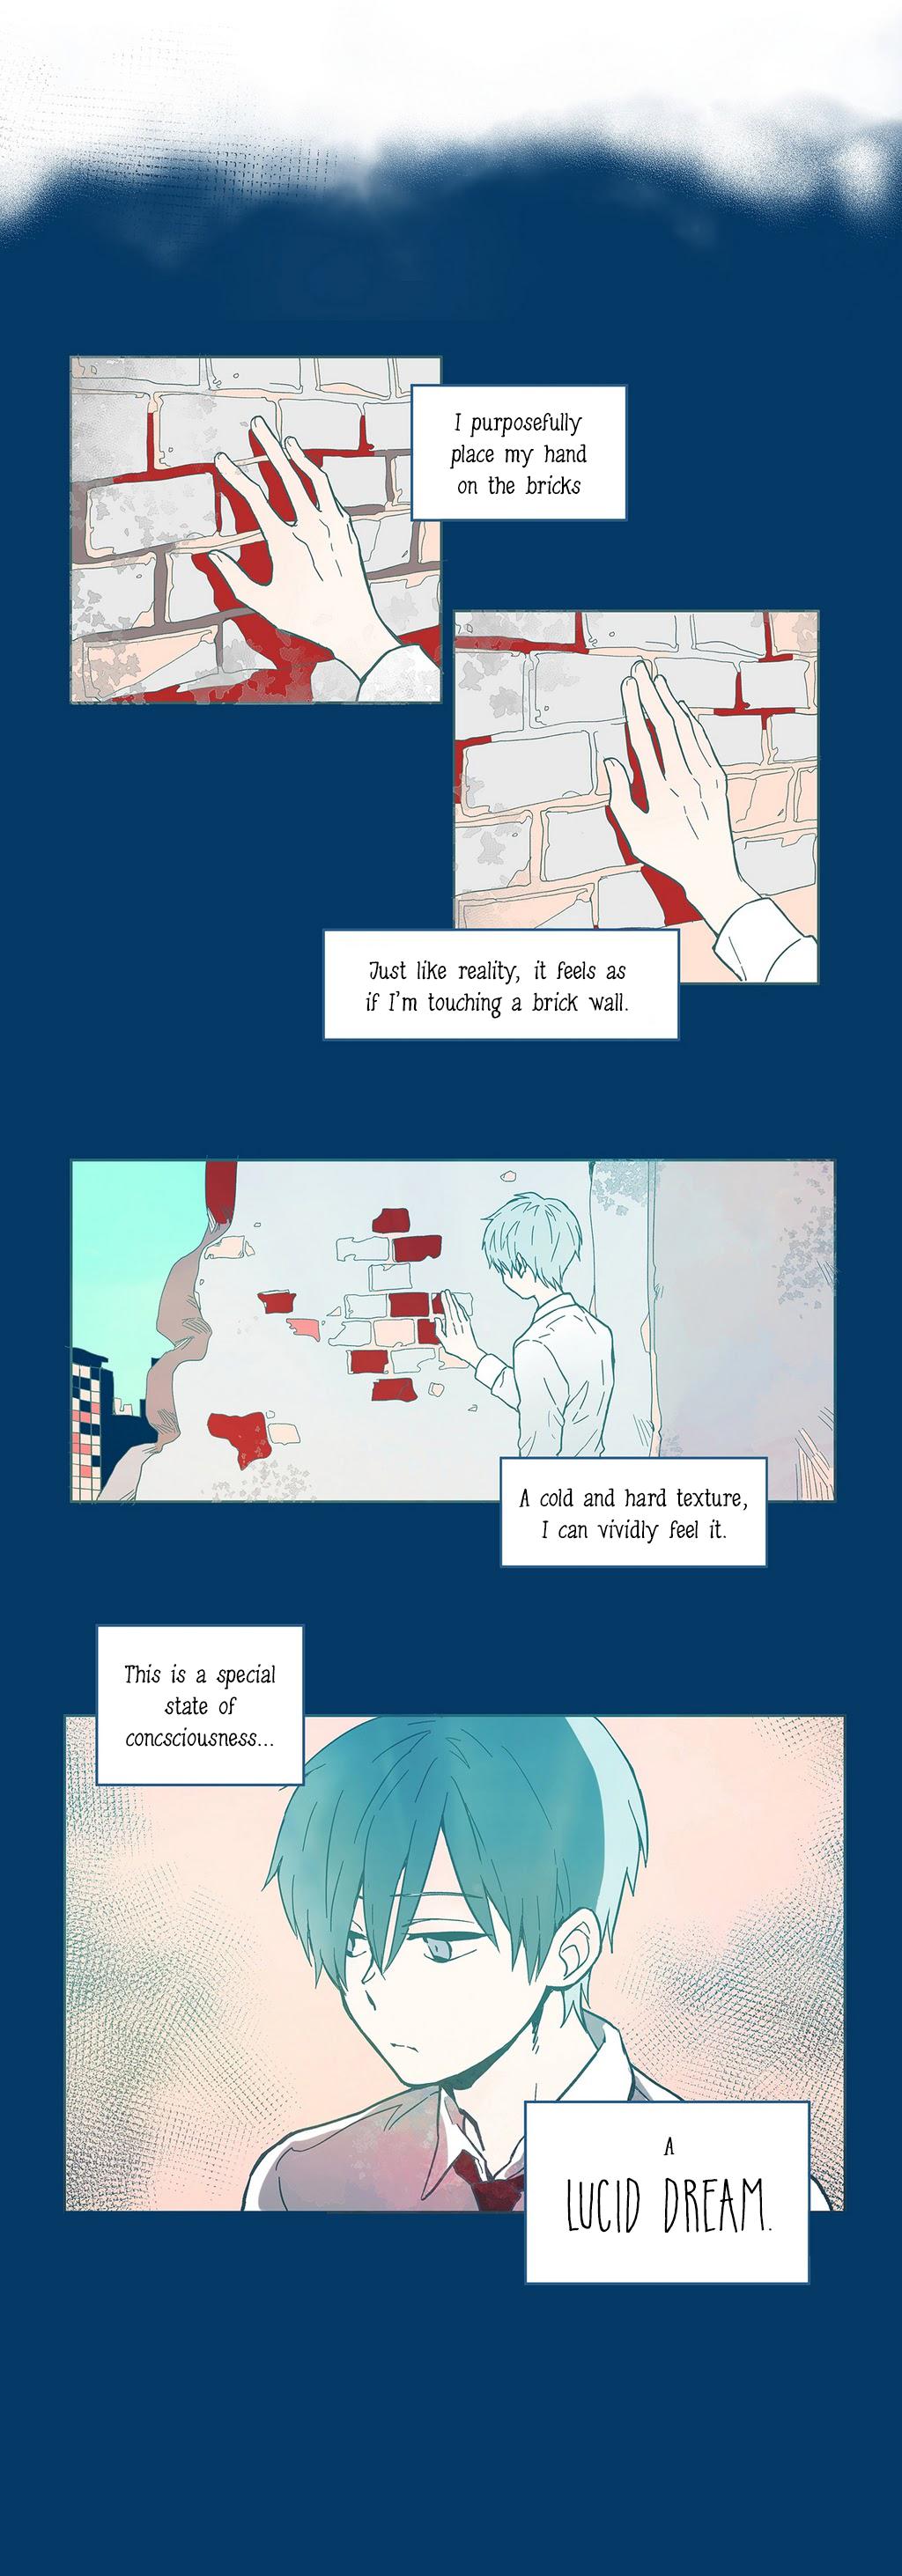 Lucid Dream Chapter 1: Episode 1 - MangaHasu